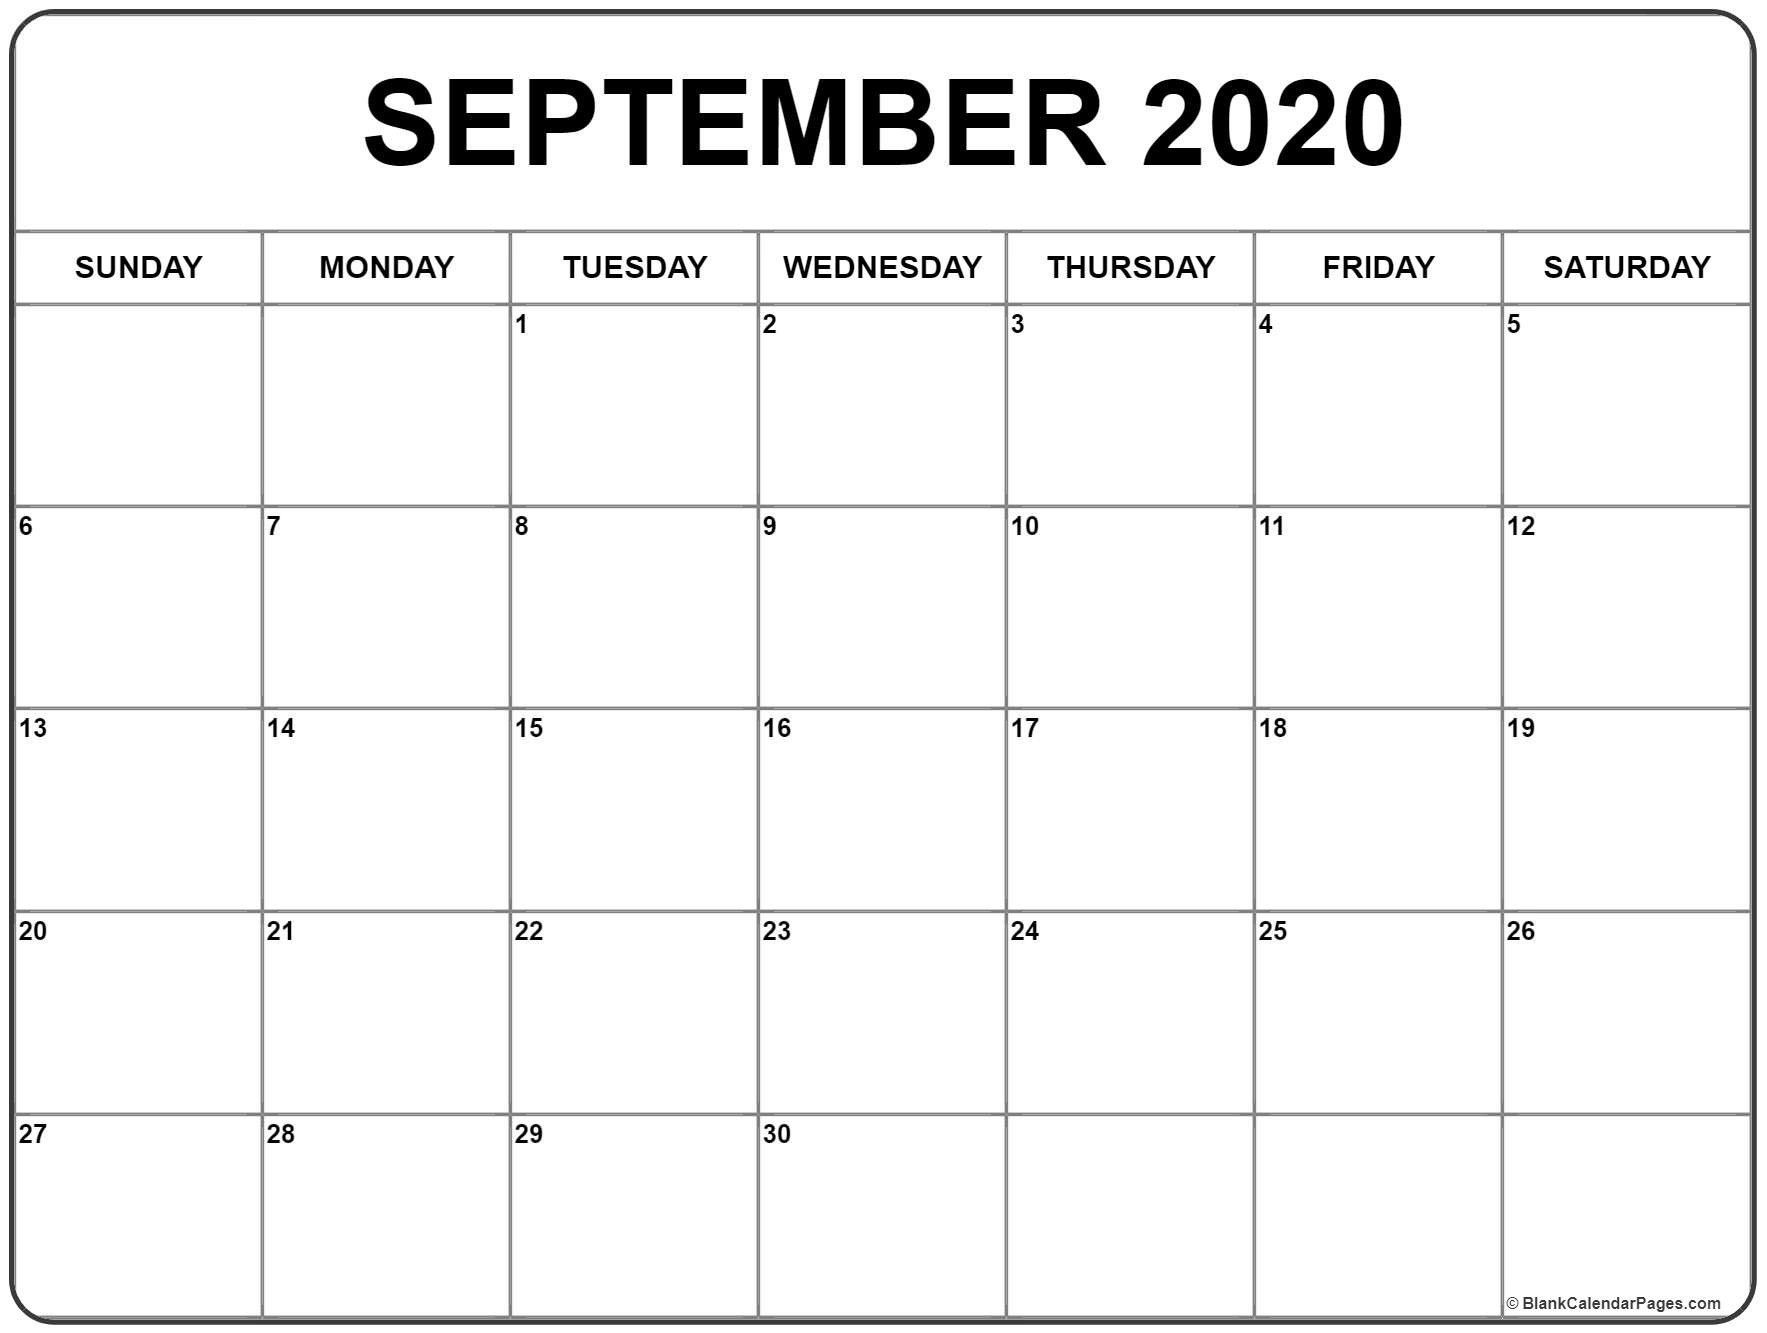 September 2020 Calendar 51 Calendar Templates Of 2020  Blank September Calendar 2020 Monday Through Sunday